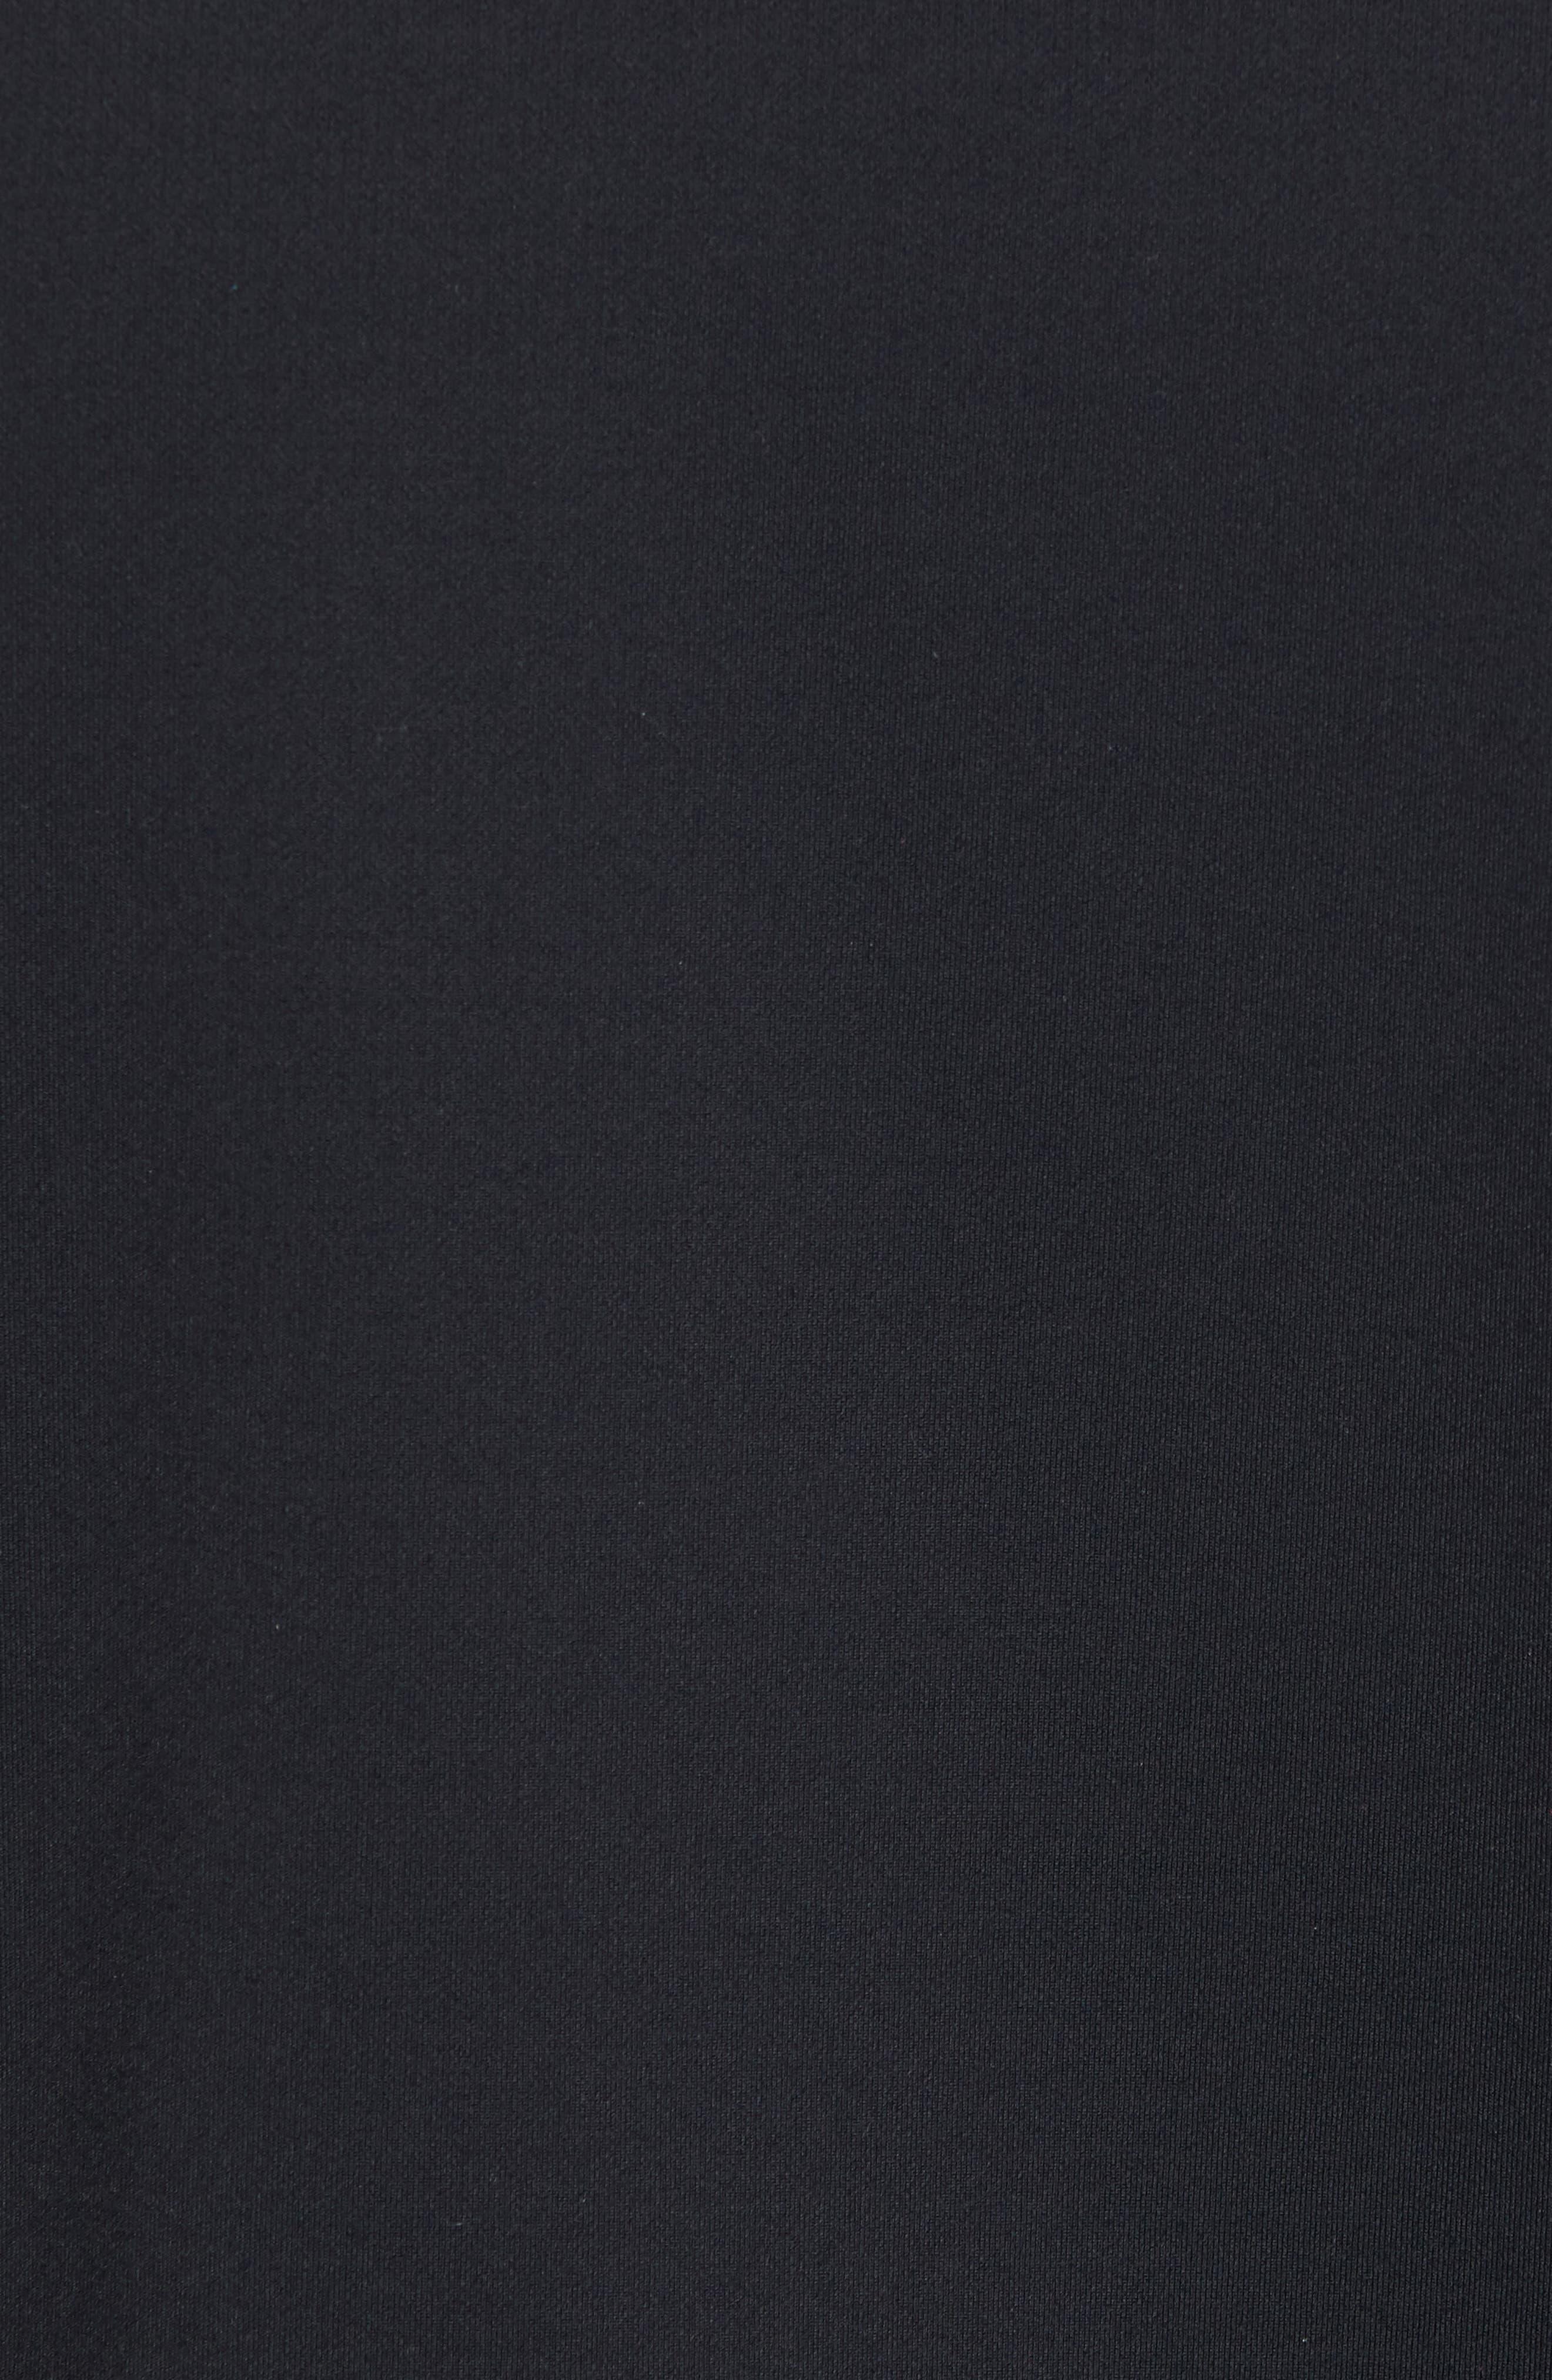 Inversion Relaxed Bomber Jacket,                             Alternate thumbnail 5, color,                             Black